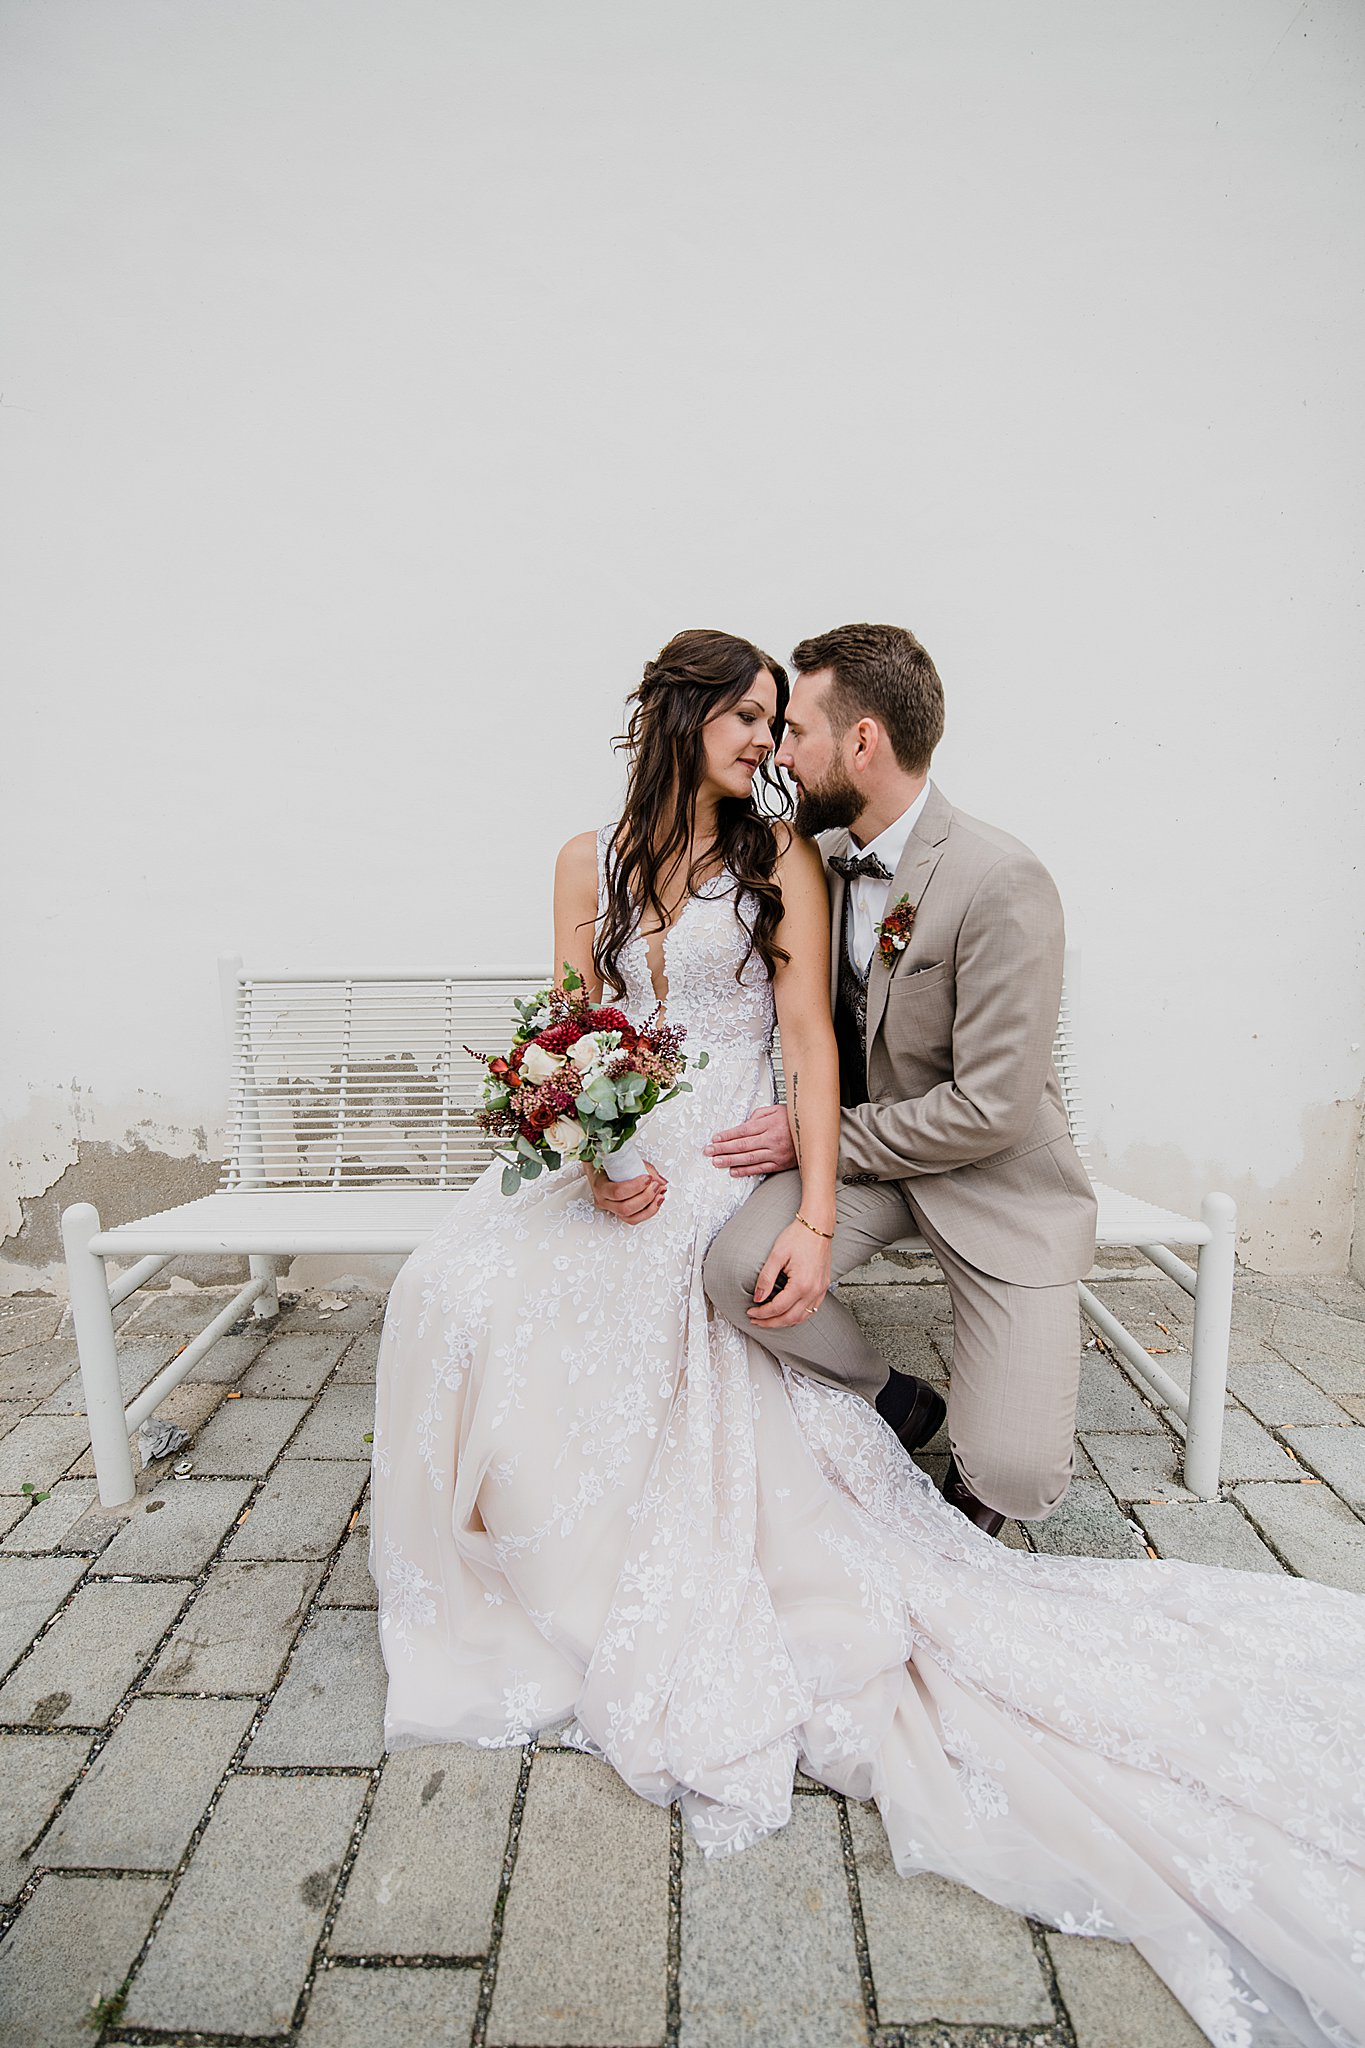 Hochzeitsfotograf-Oberpfalz-Bayern-Amberg_2679